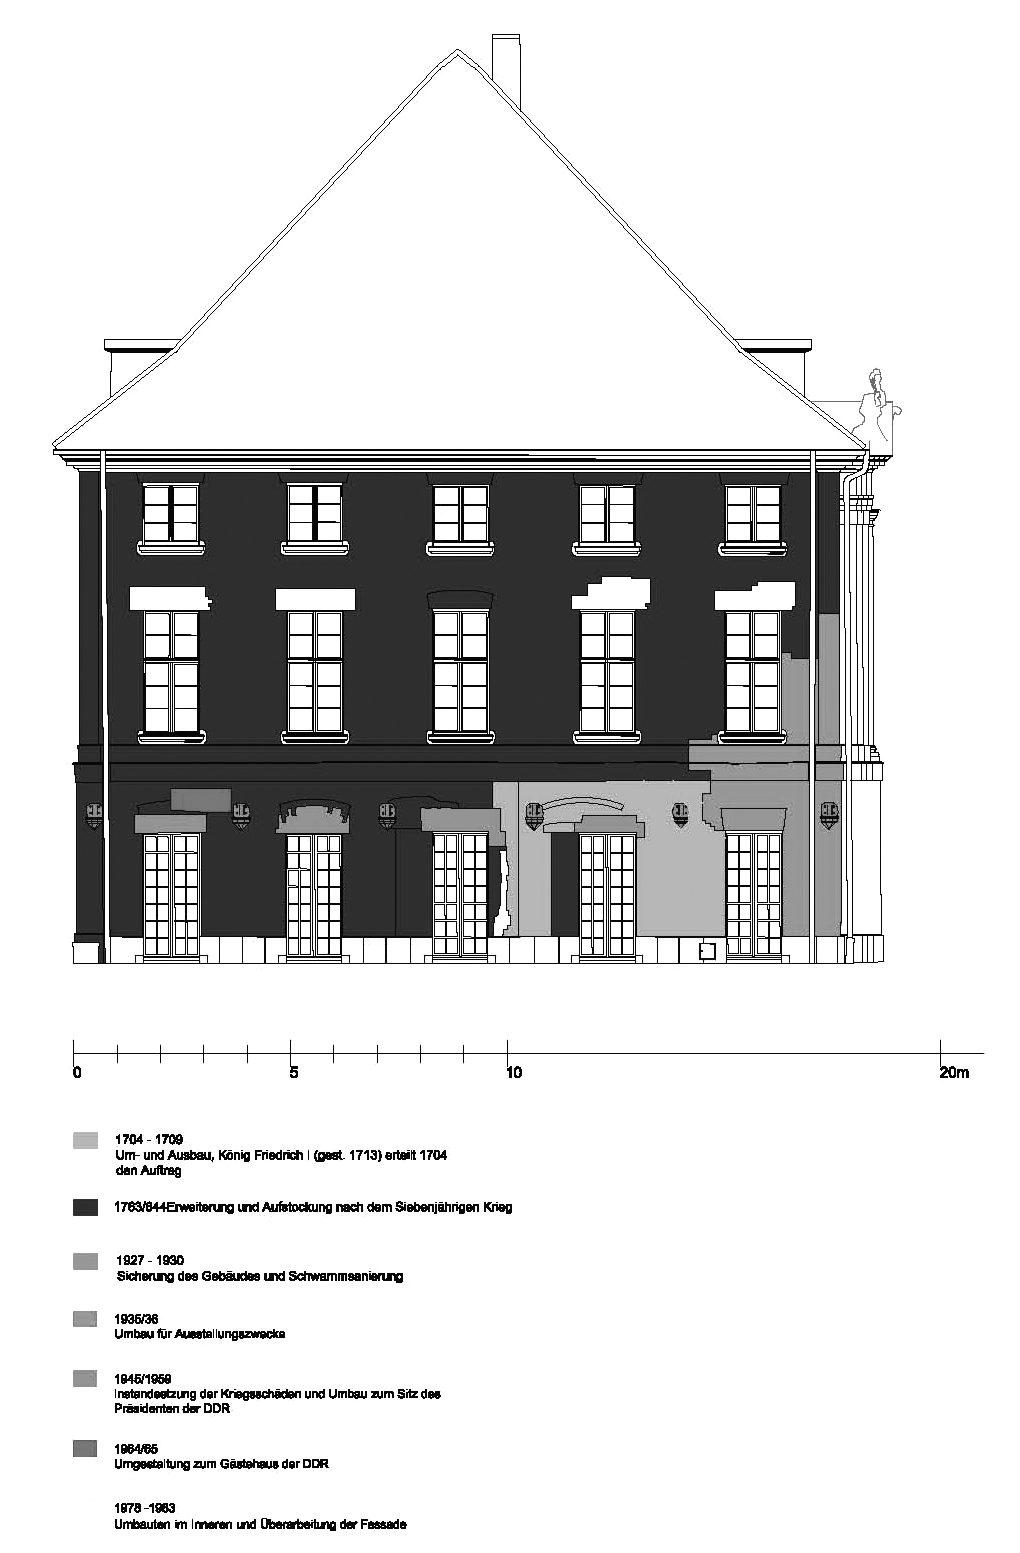 Sh fassade sud bauphasen technische universit t berlin for Technische universitat berlin architektur